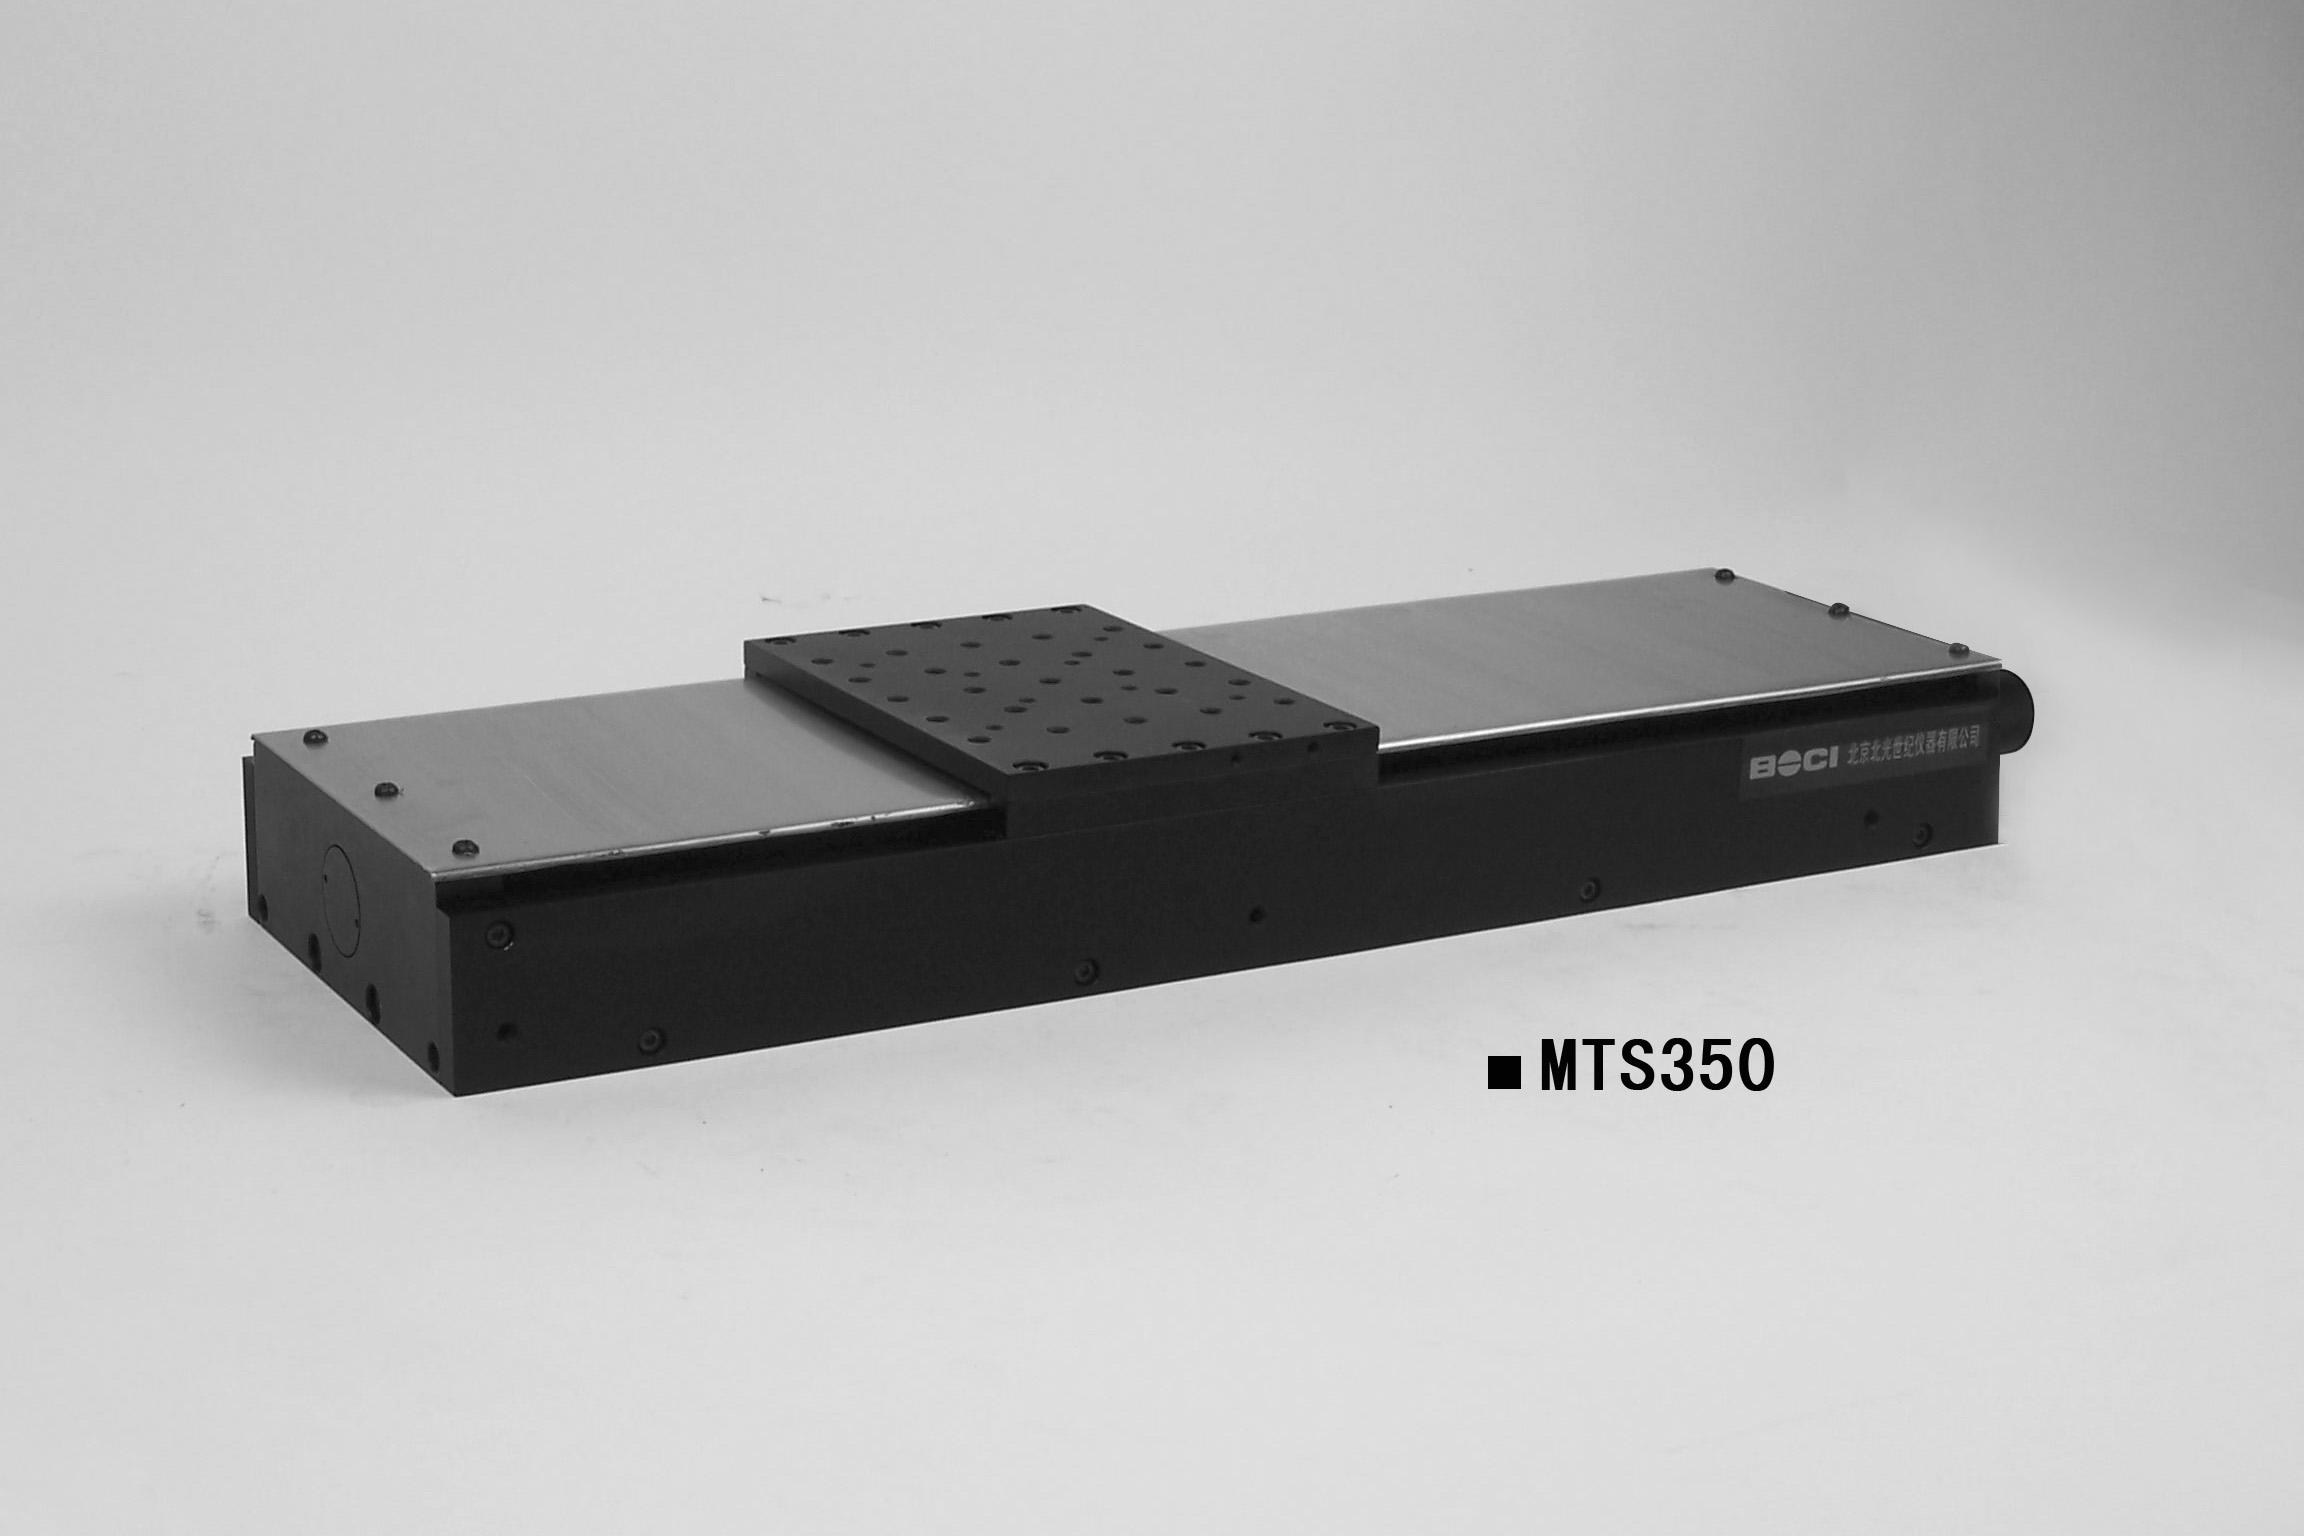 mts350 系列精密重载型电控平移台图片